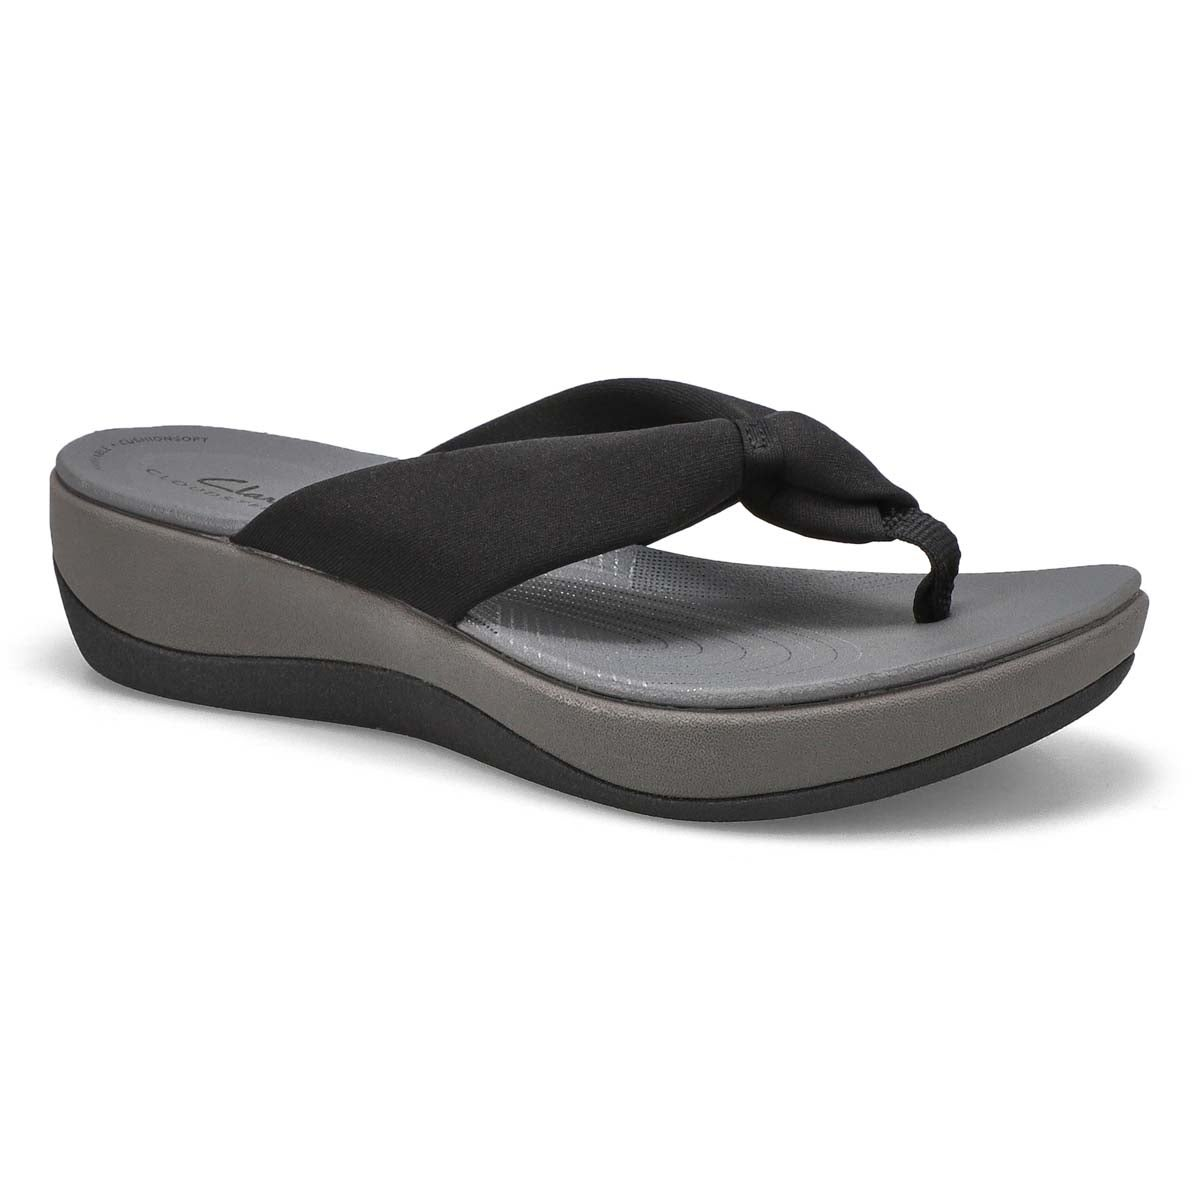 Lds Arla Glison black thong wedge sandal